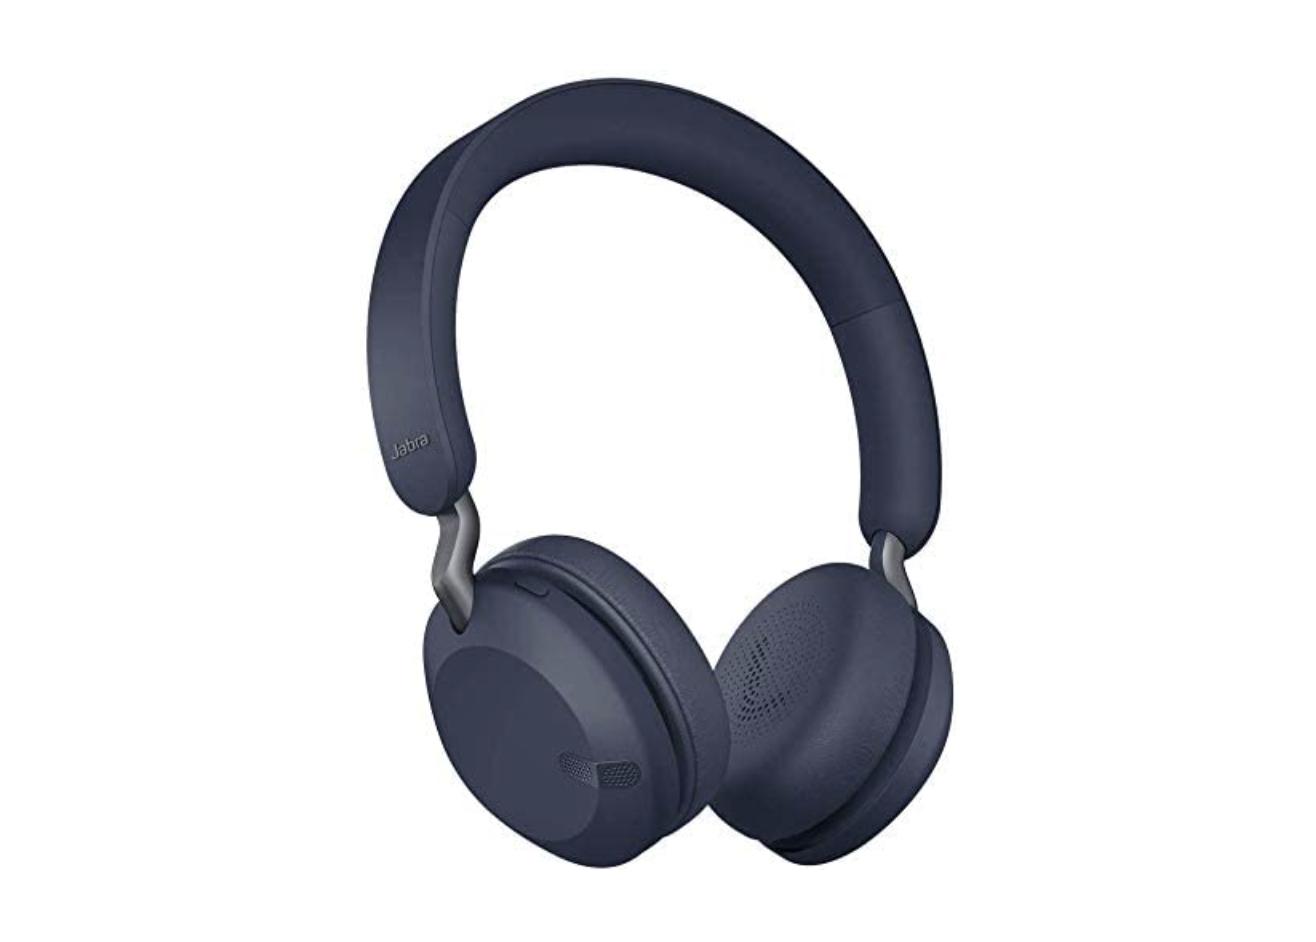 Jabra-Elite-On-Ear-Wireless-Headphones